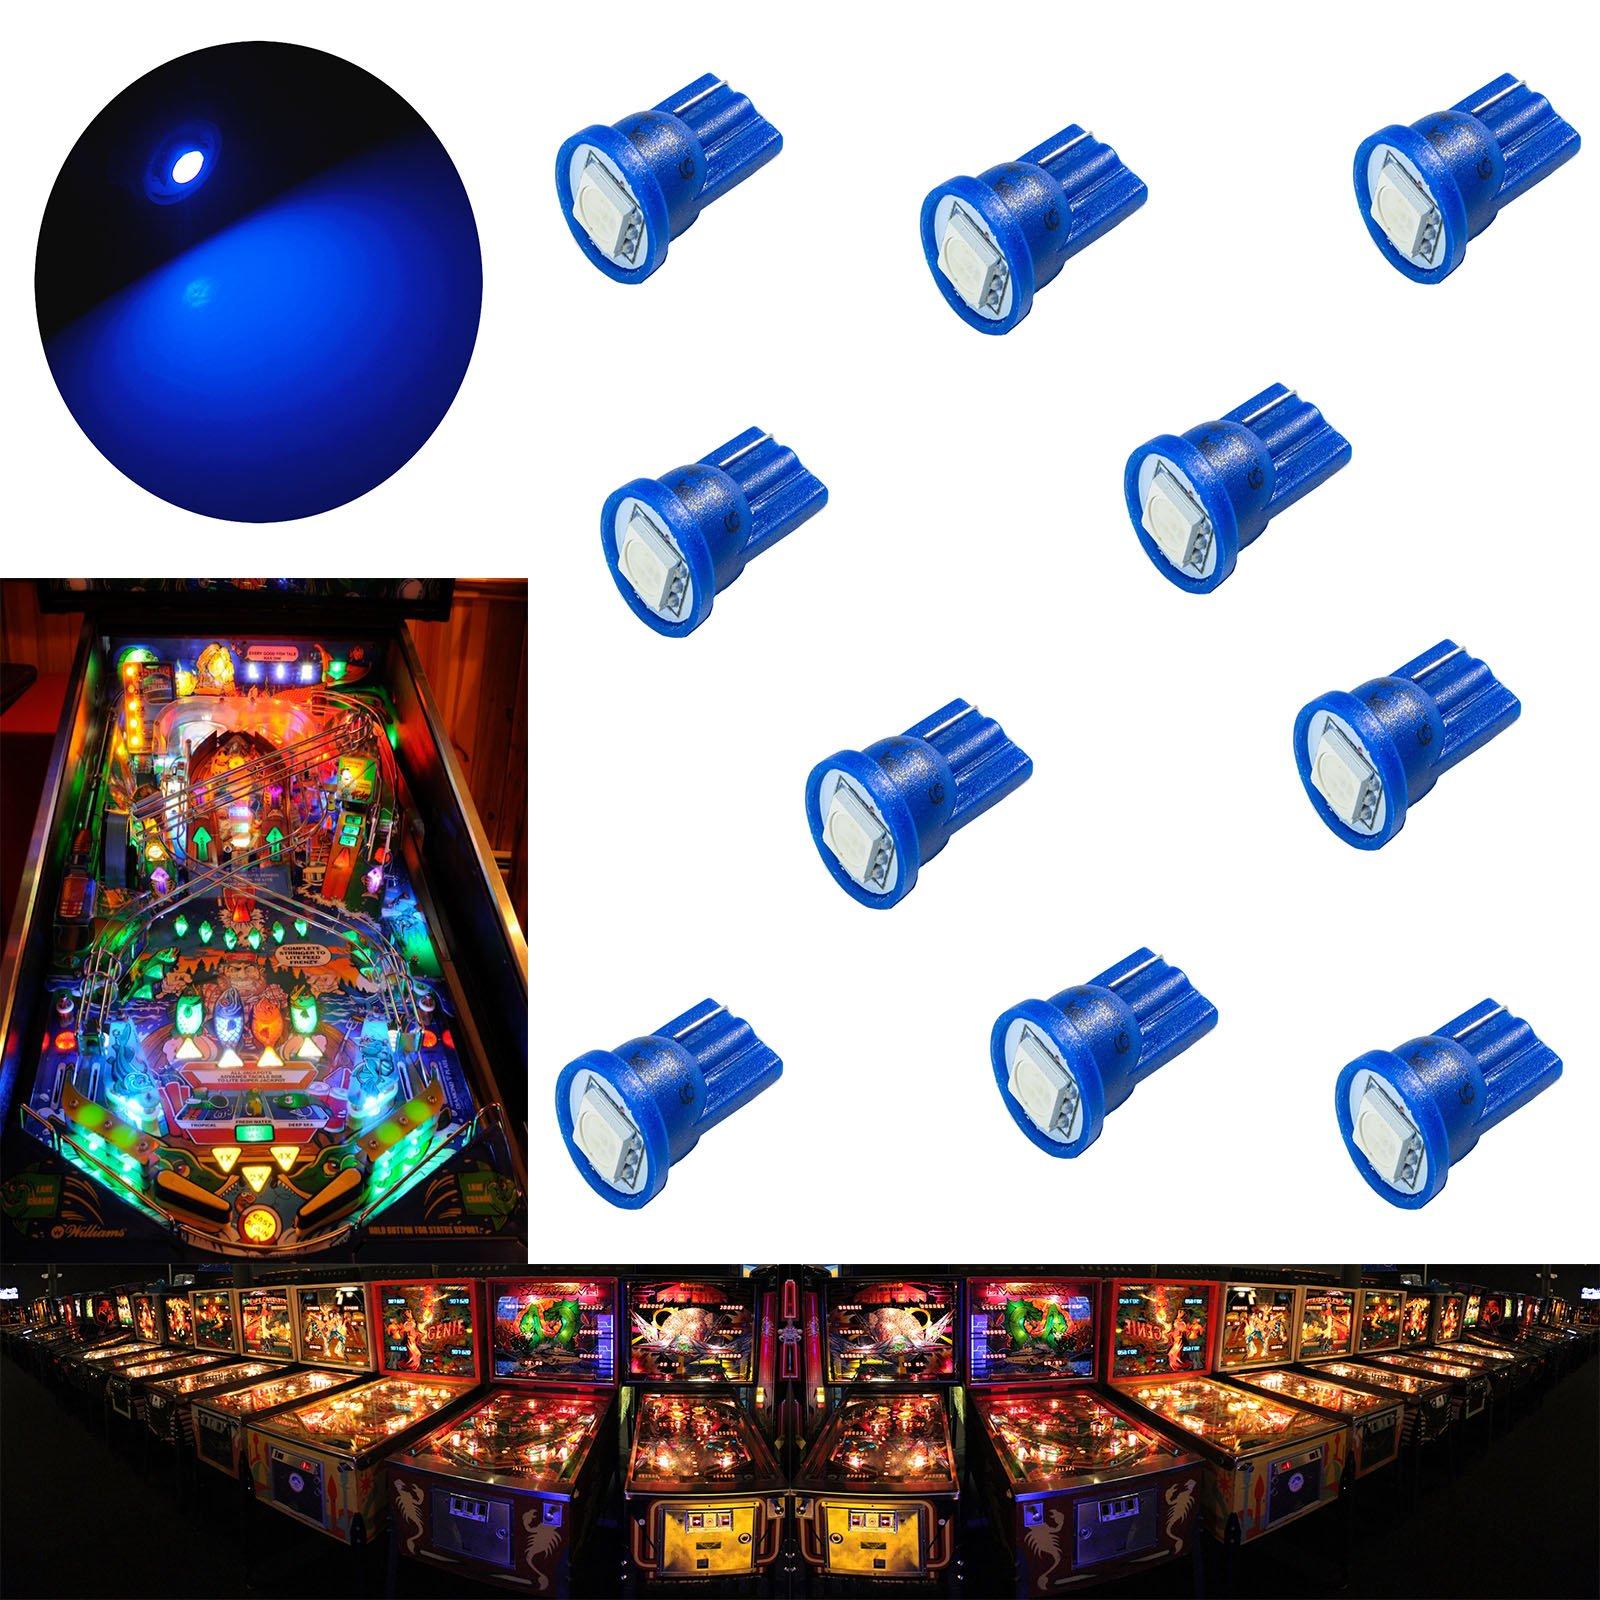 PA 10PCS #555 T10 1SMD LED Wedge Pinball Machine Light Top View Bulb Blue-6.3V